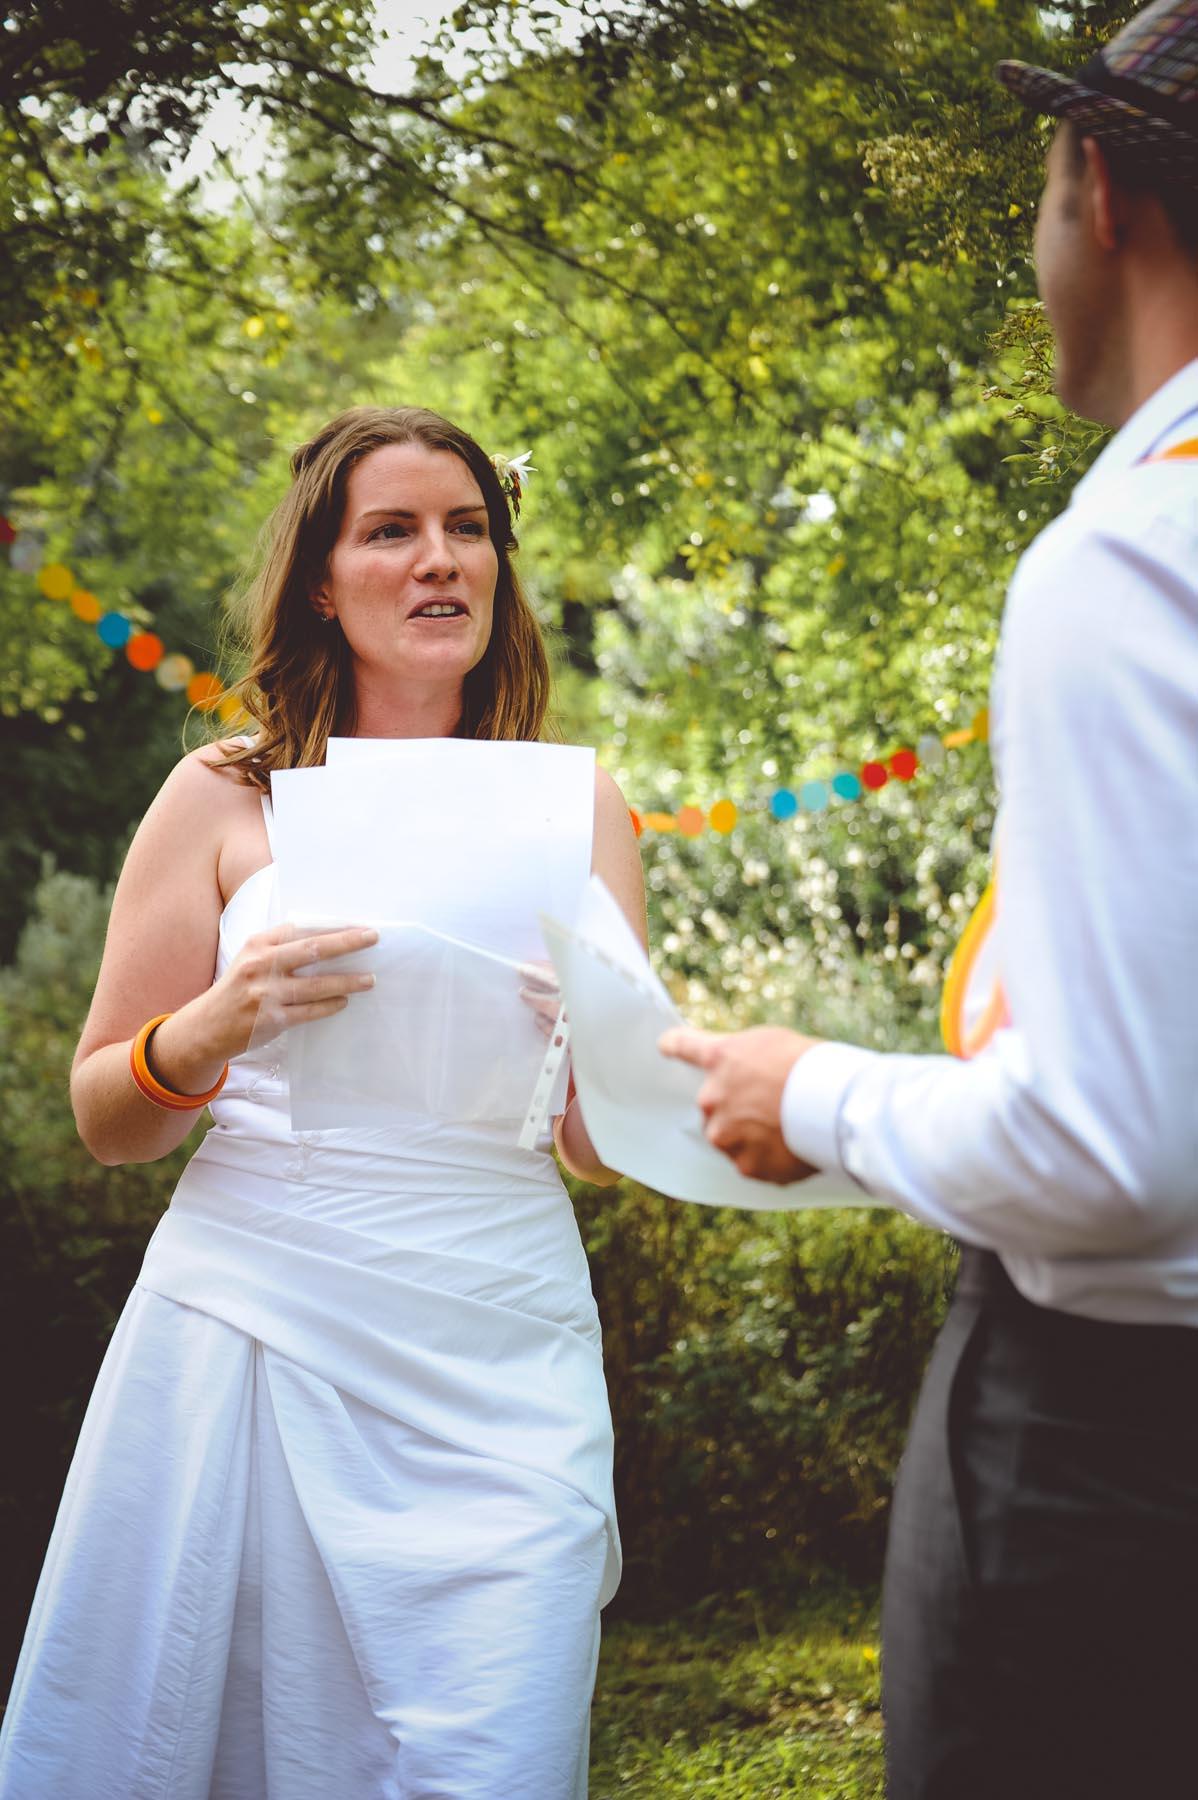 Photographe mariage original toulouse montpellier - M et S - Mademoiselle G Photographie (55)